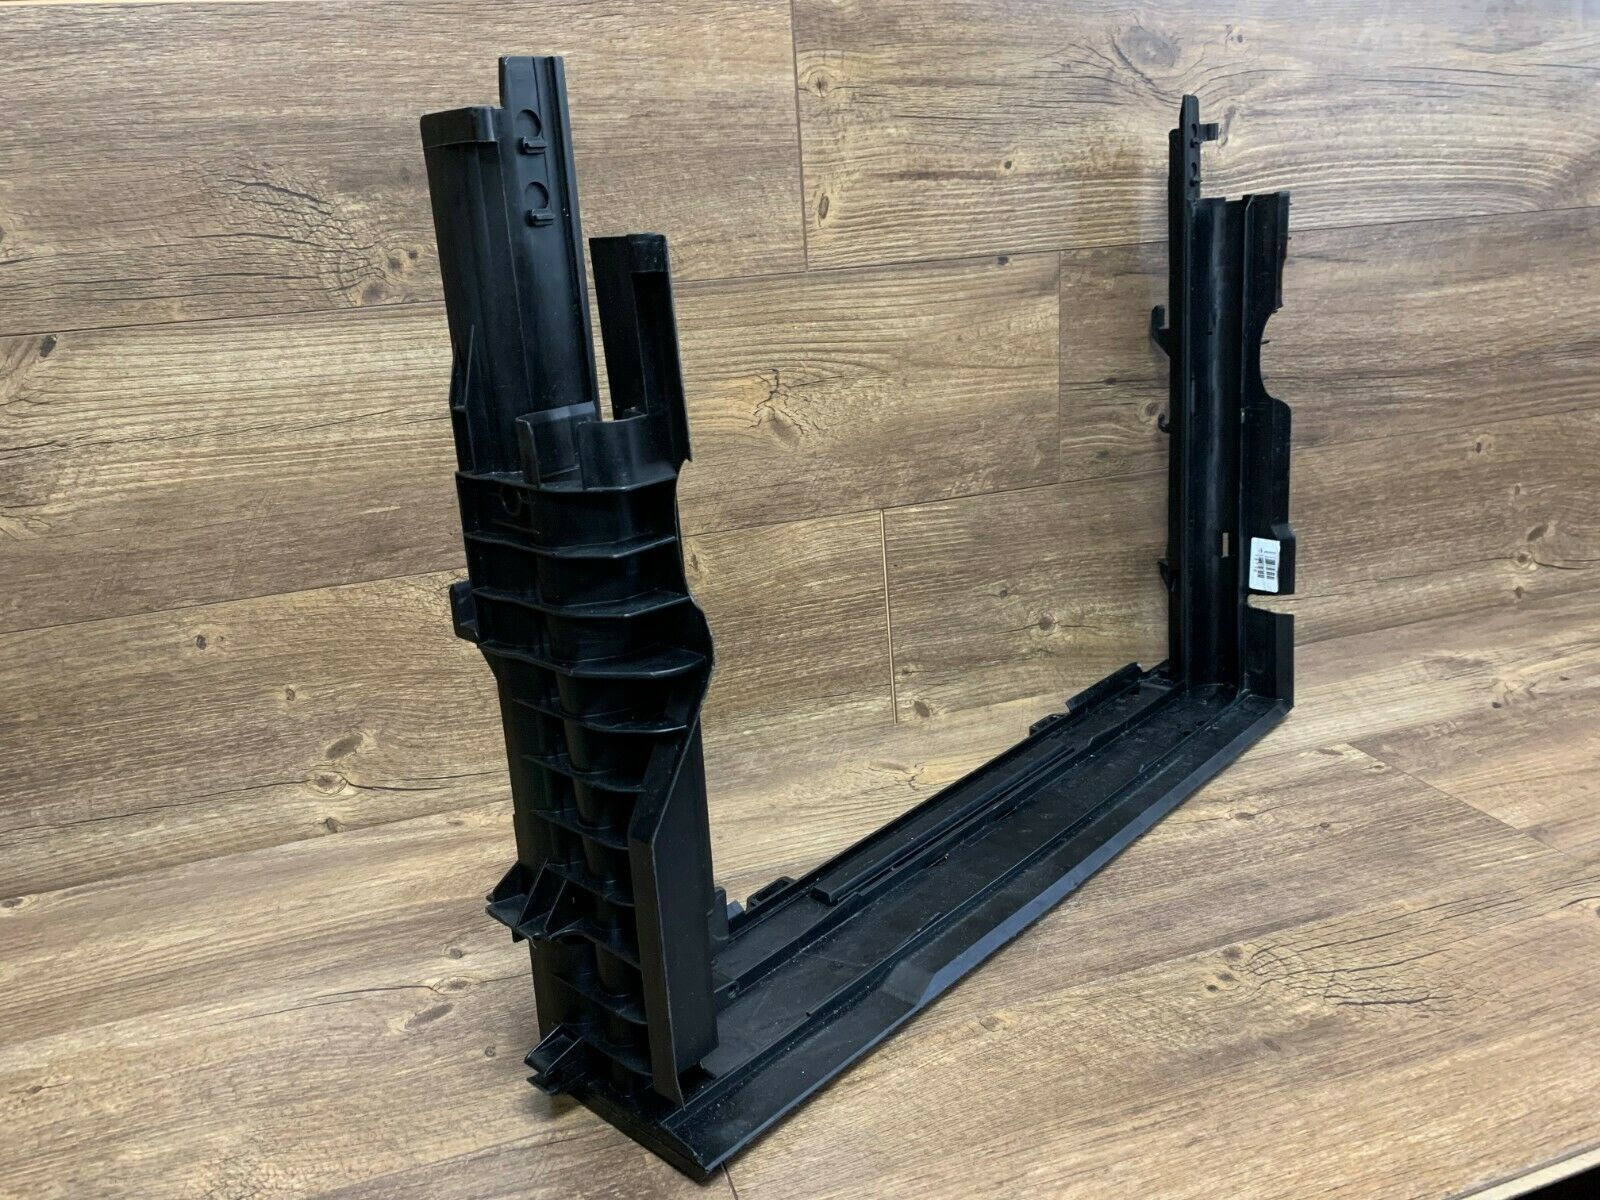 For BMW E60 E60N E61 E63 E64 Lower Radiator Support Carrier Mount Genuine